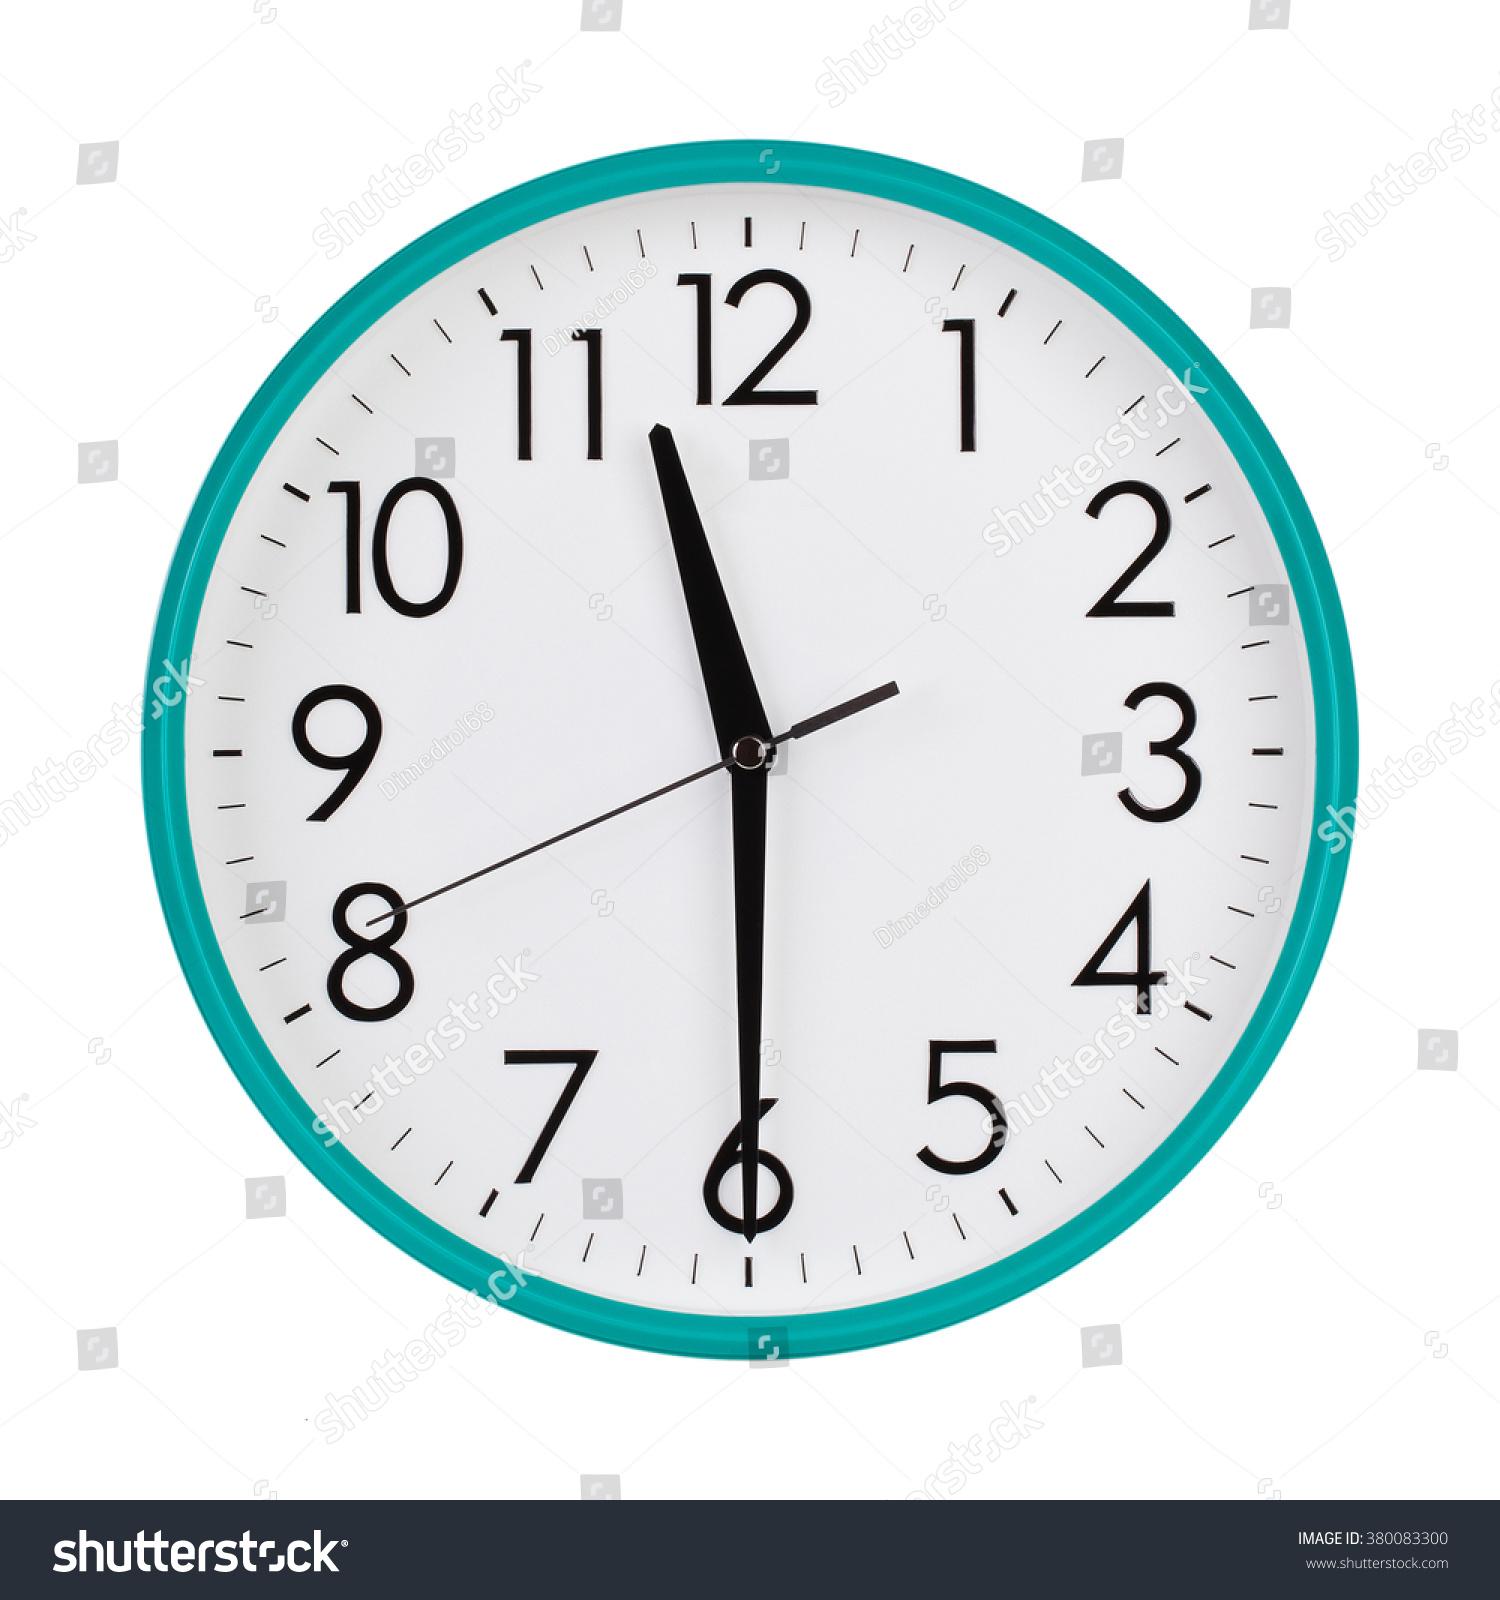 Half Past Eleven On Round Clock Stock Photo